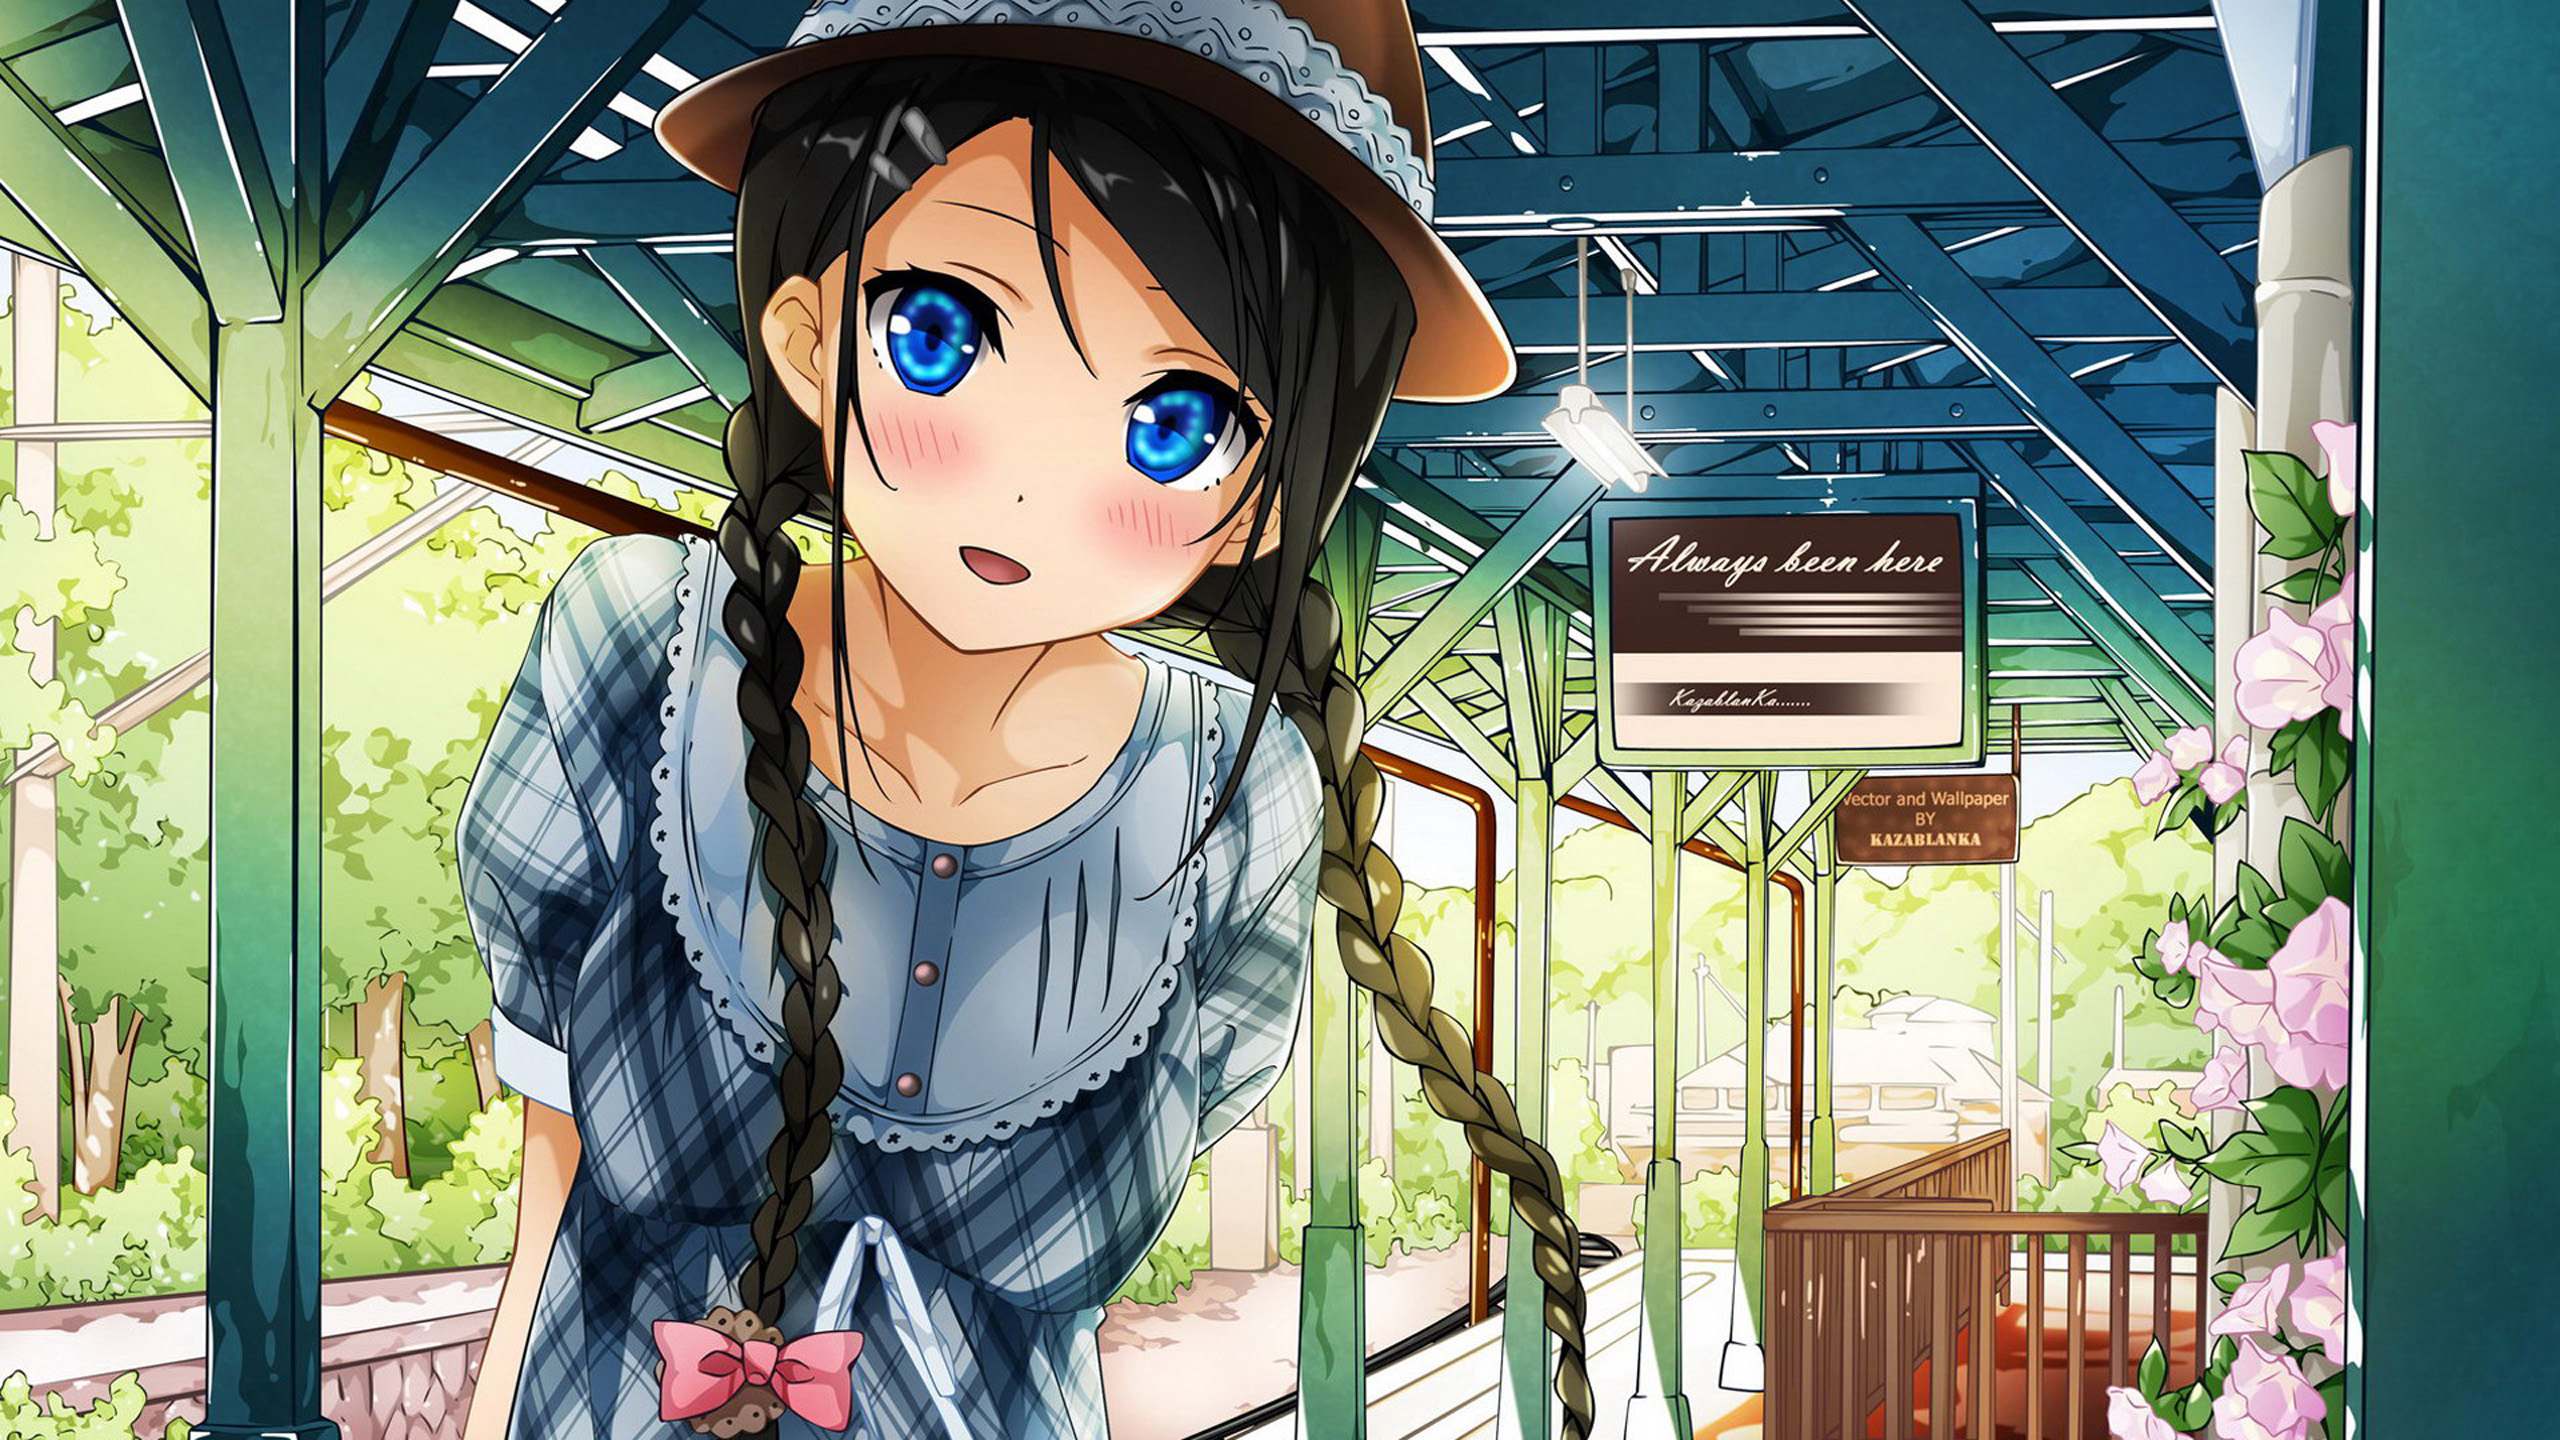 Cute Anime Wallpapers Hd Cute Anime Wallpaper Hd 1721482 Hd